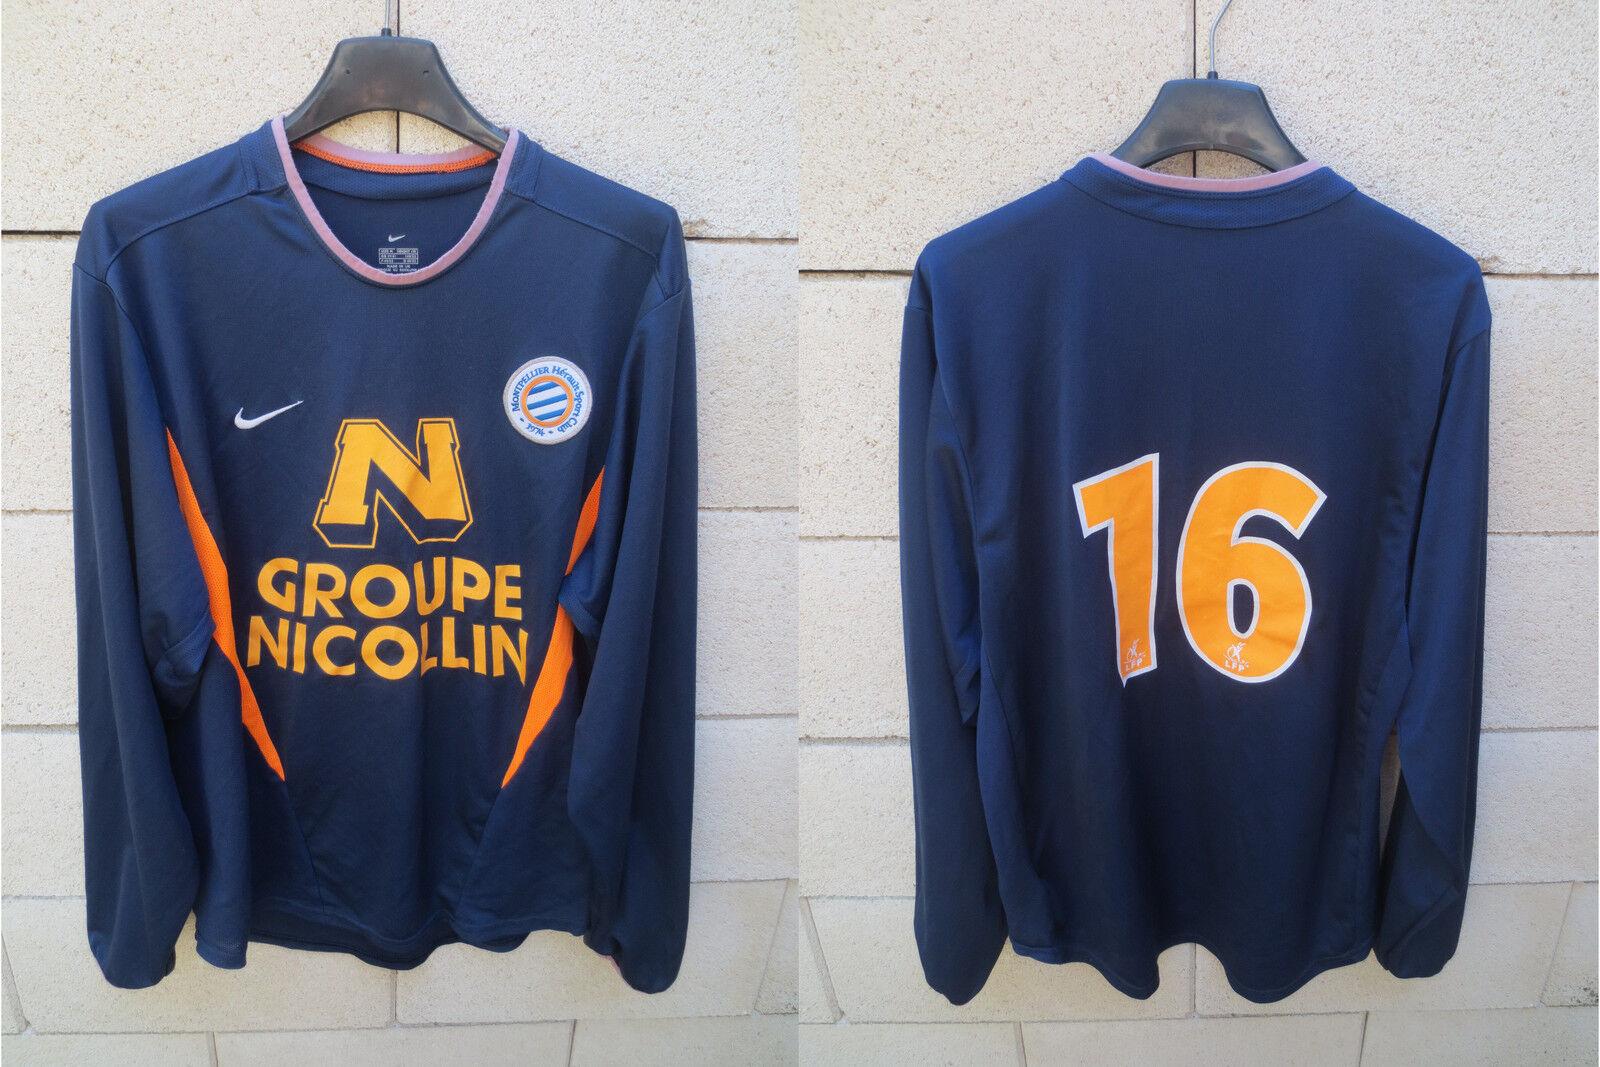 Maillot porté n°16 MONTPELLIER NIKE MHSC vintage match worn shirt football